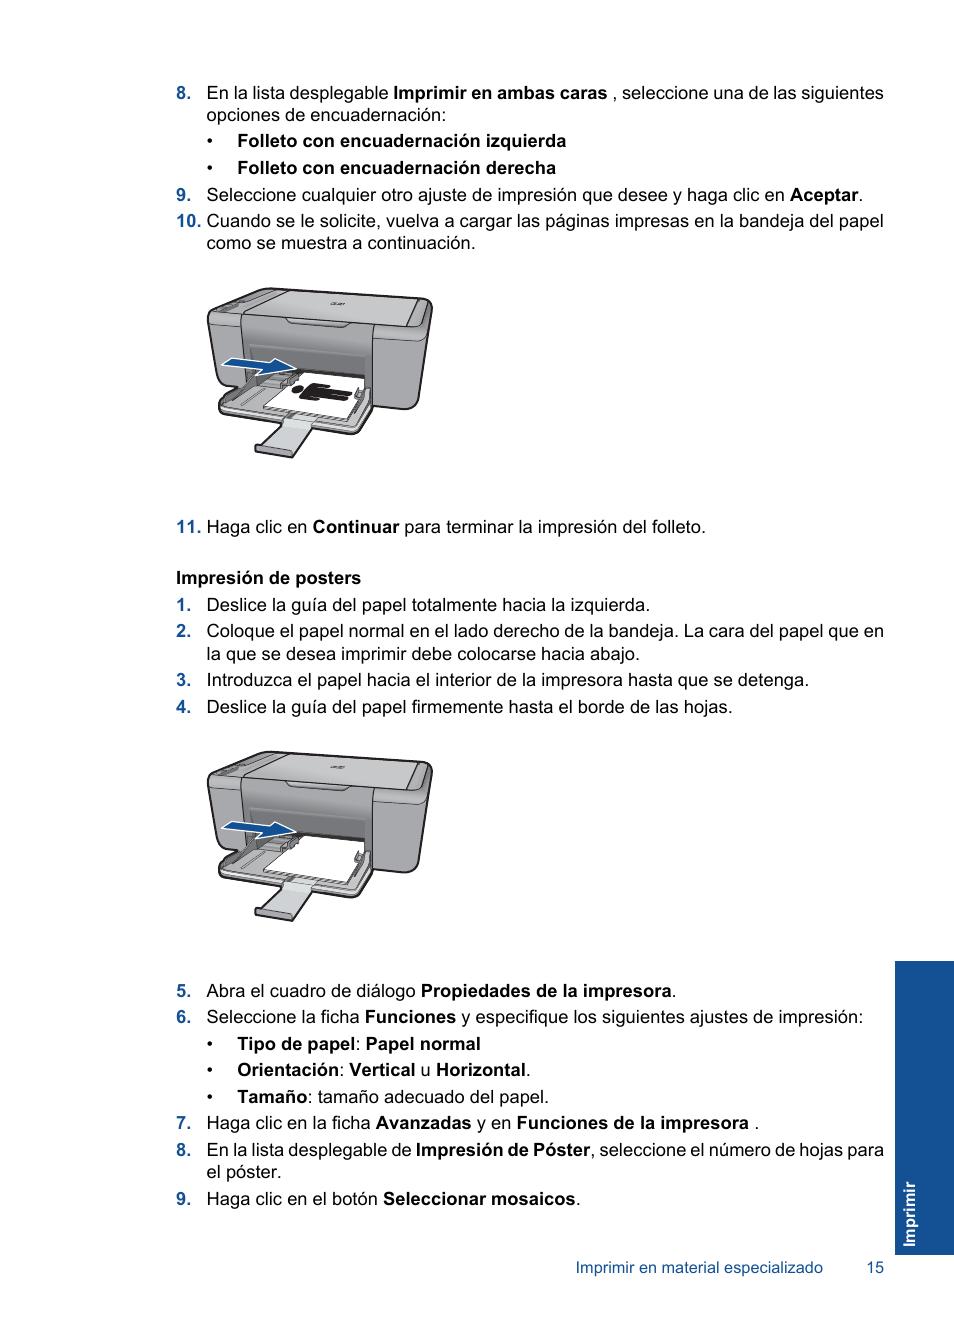 HP Impresora Todo-en-Uno HP Deskjet F2480 Manual del usuario ...